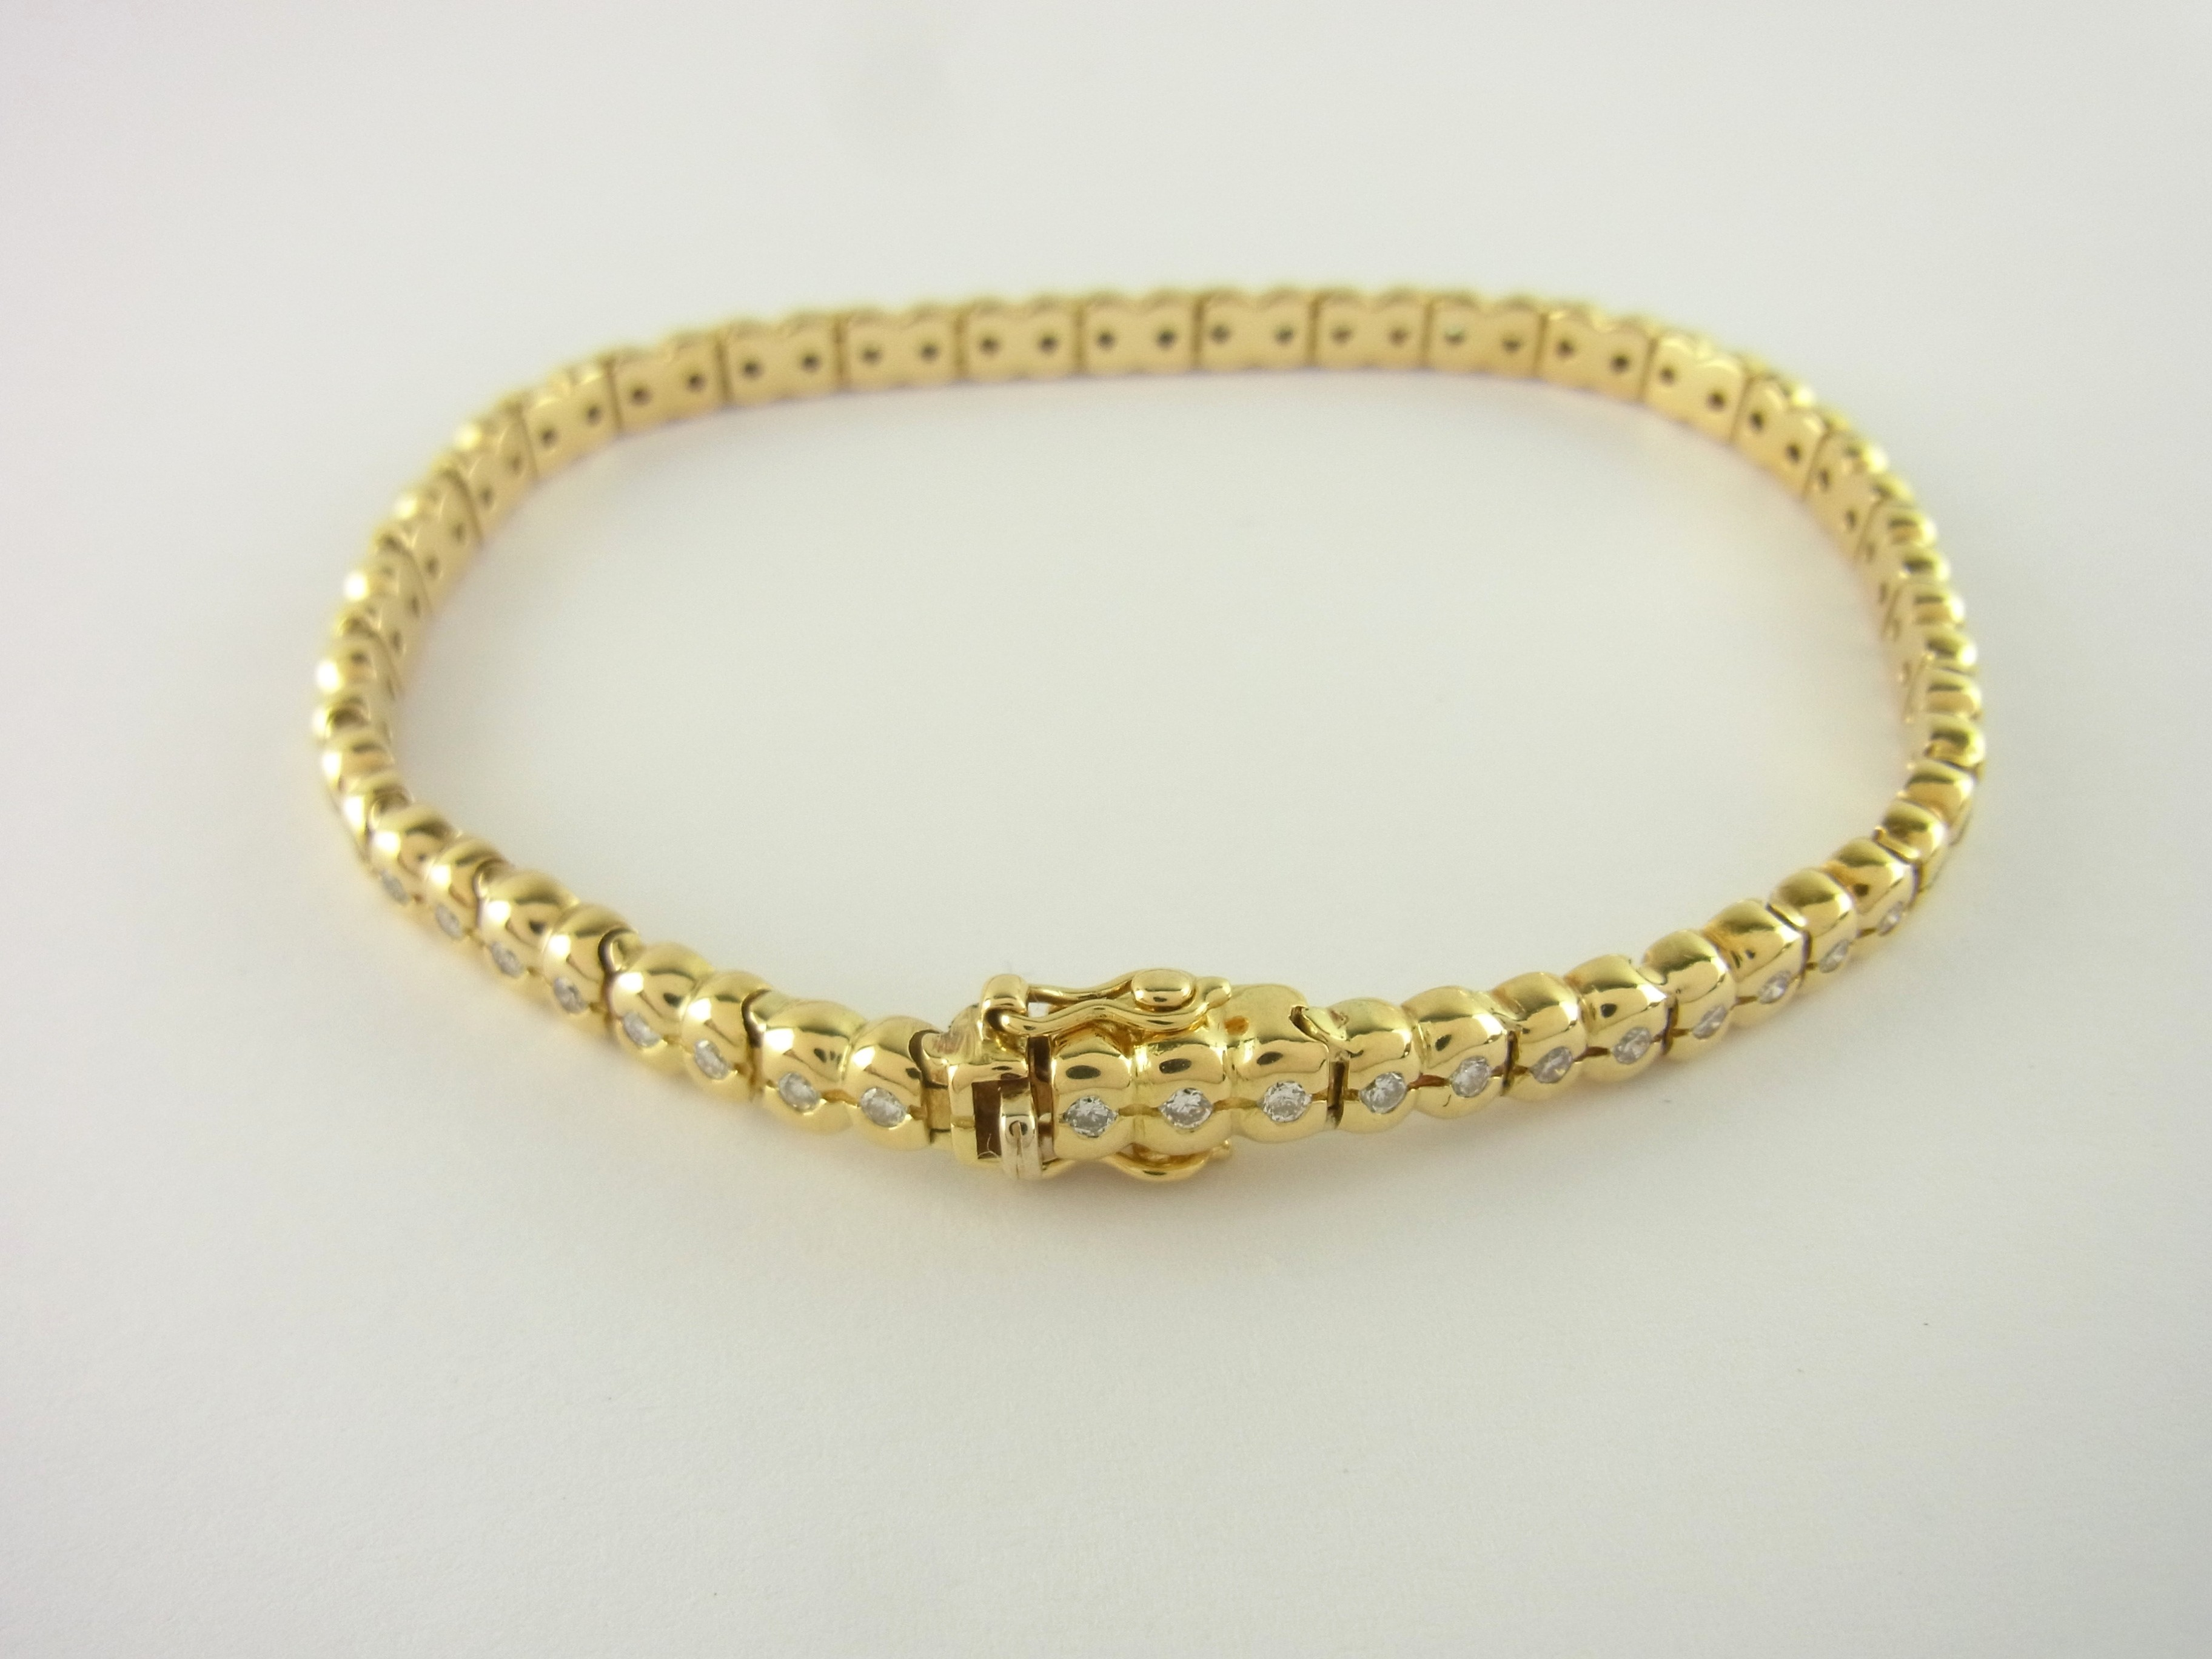 tennis armband wempe 18 kt gelbgold mit diamanten. Black Bedroom Furniture Sets. Home Design Ideas